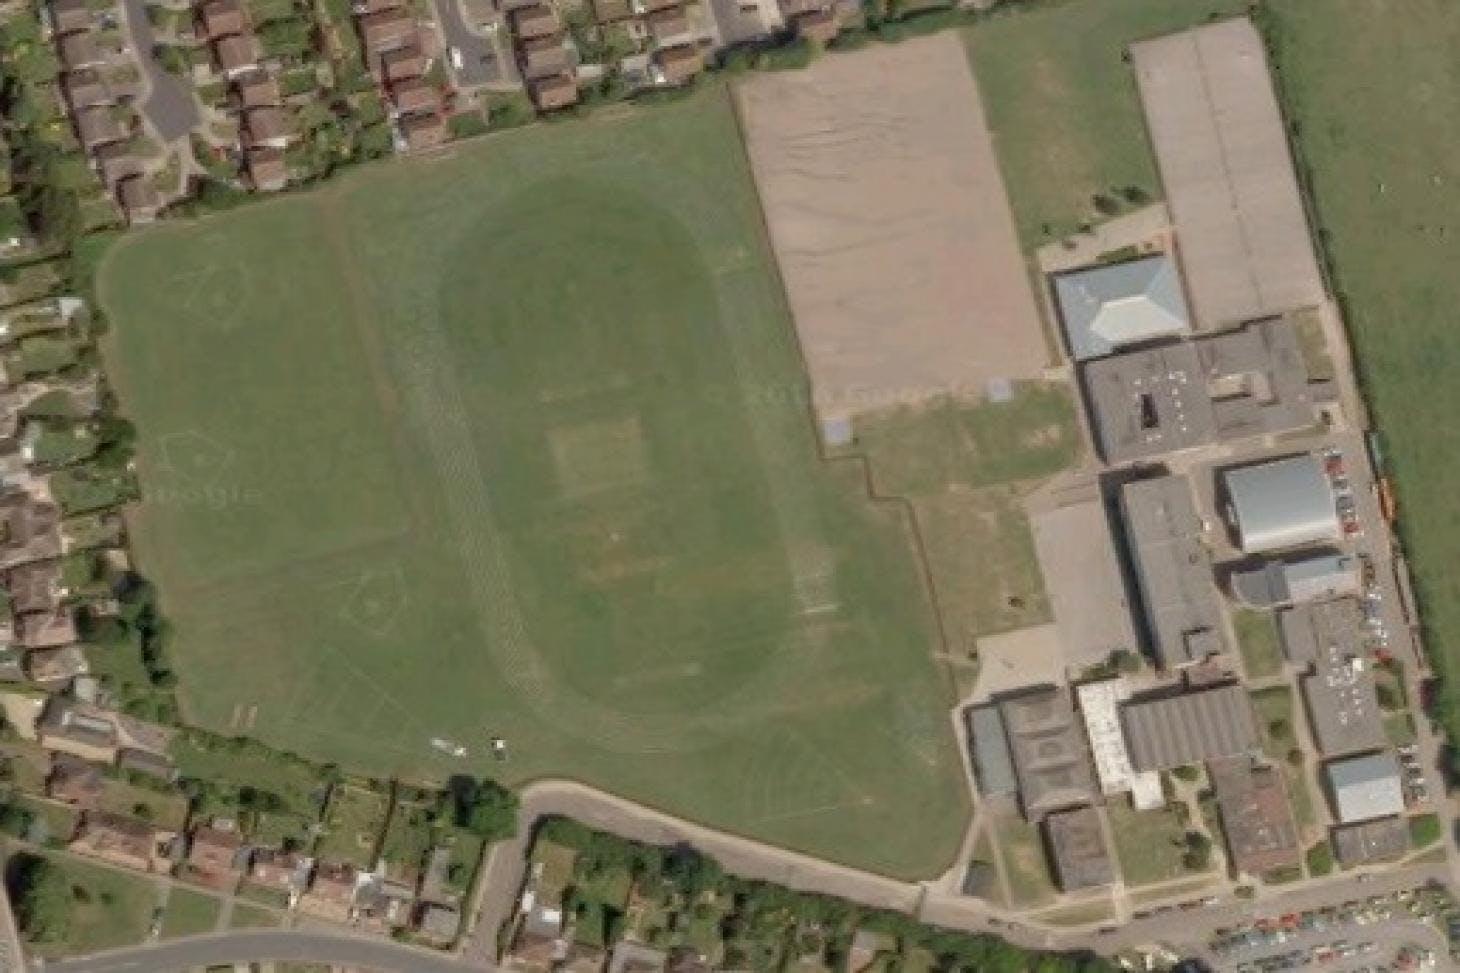 Cardinal Newman Catholic School 11 a side | Grass football pitch